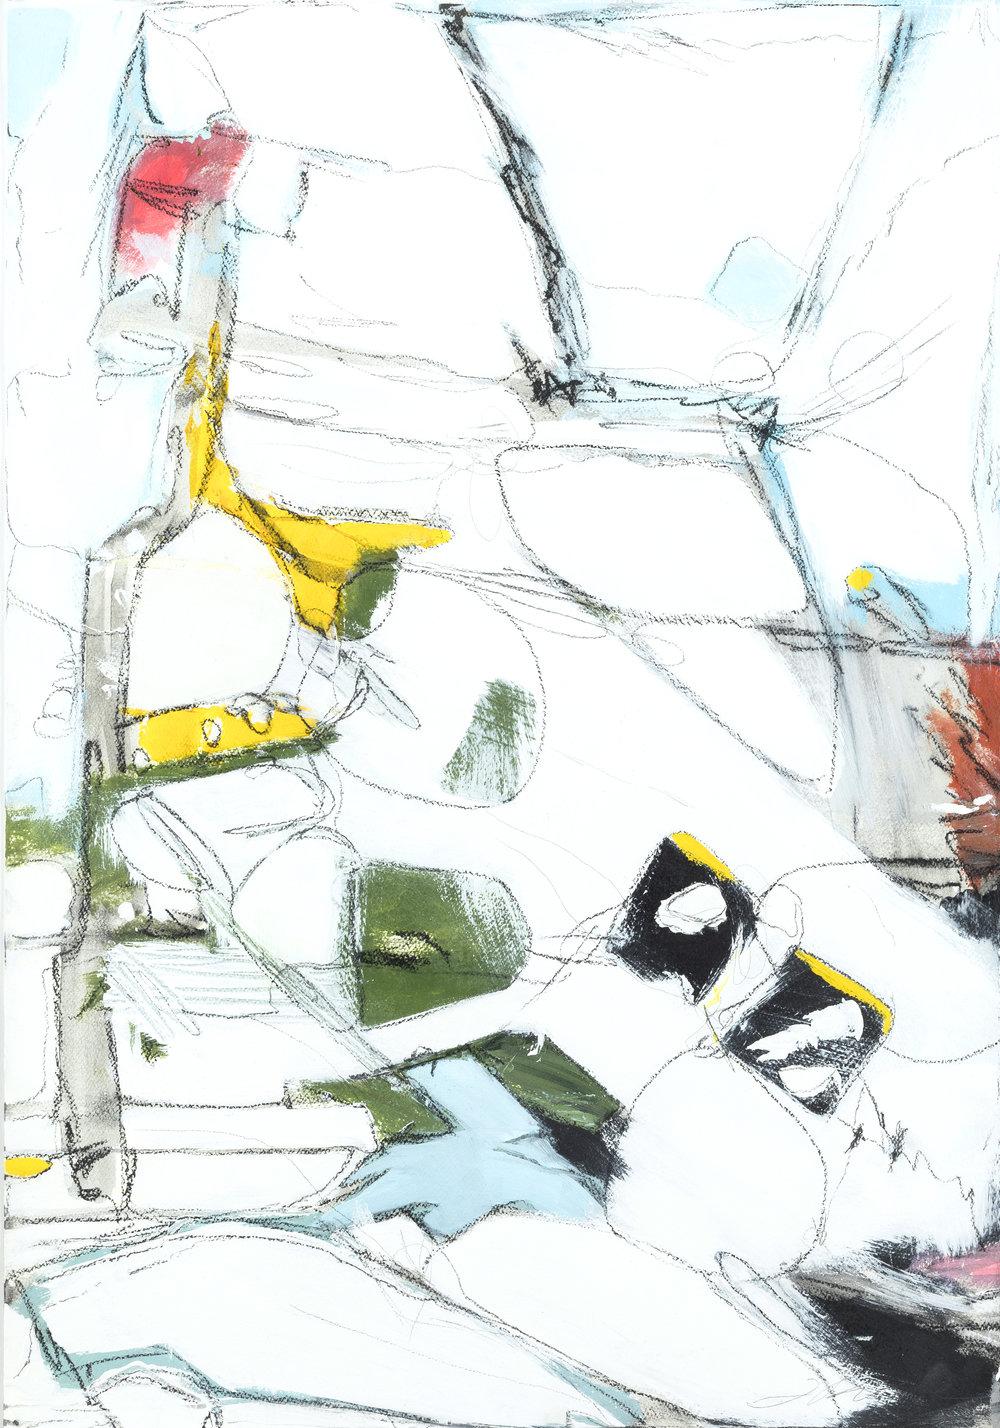 Art District - 35